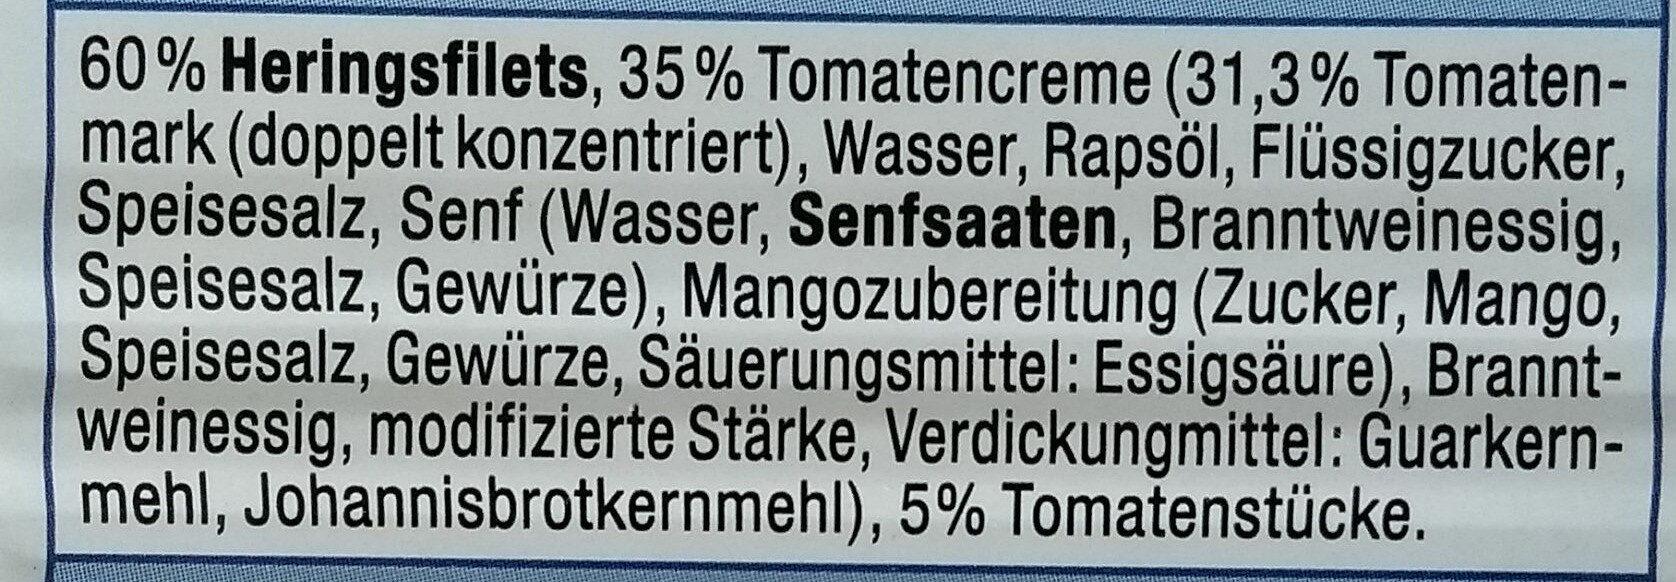 Heringsfilet Tomaten-Creme - Ingrédients - de